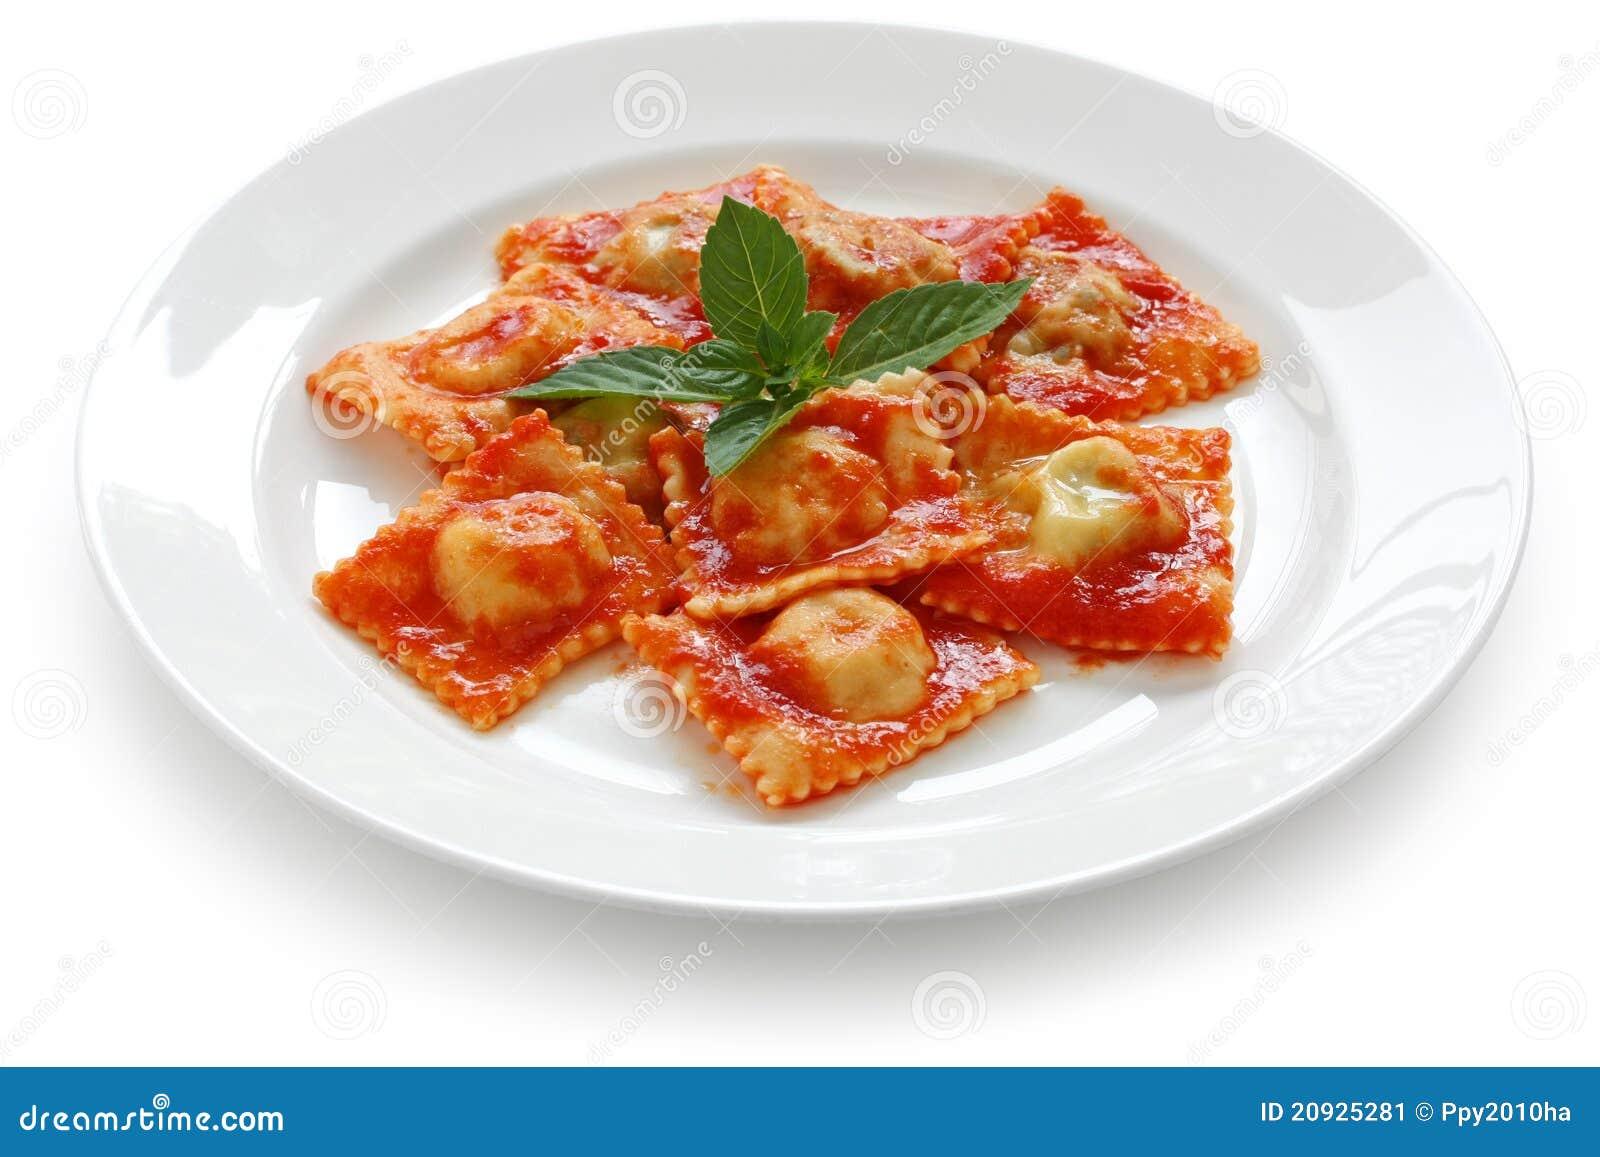 p tes de ravioli avec la sauce tomate nourriture italienne image stock image 20925281. Black Bedroom Furniture Sets. Home Design Ideas